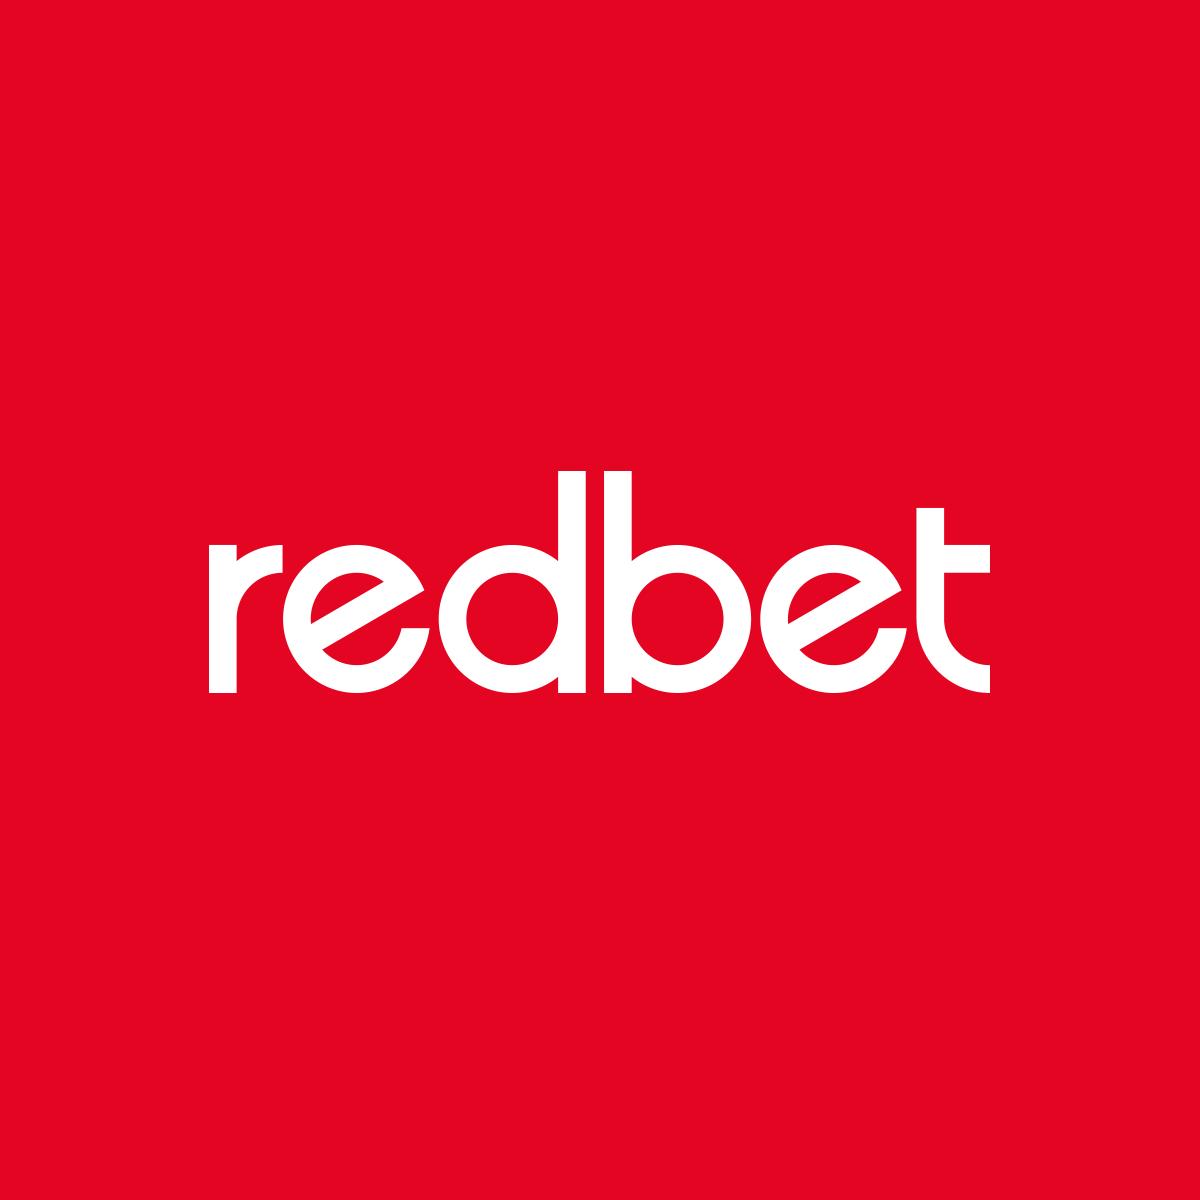 redbet casino no deposit bonus 2019